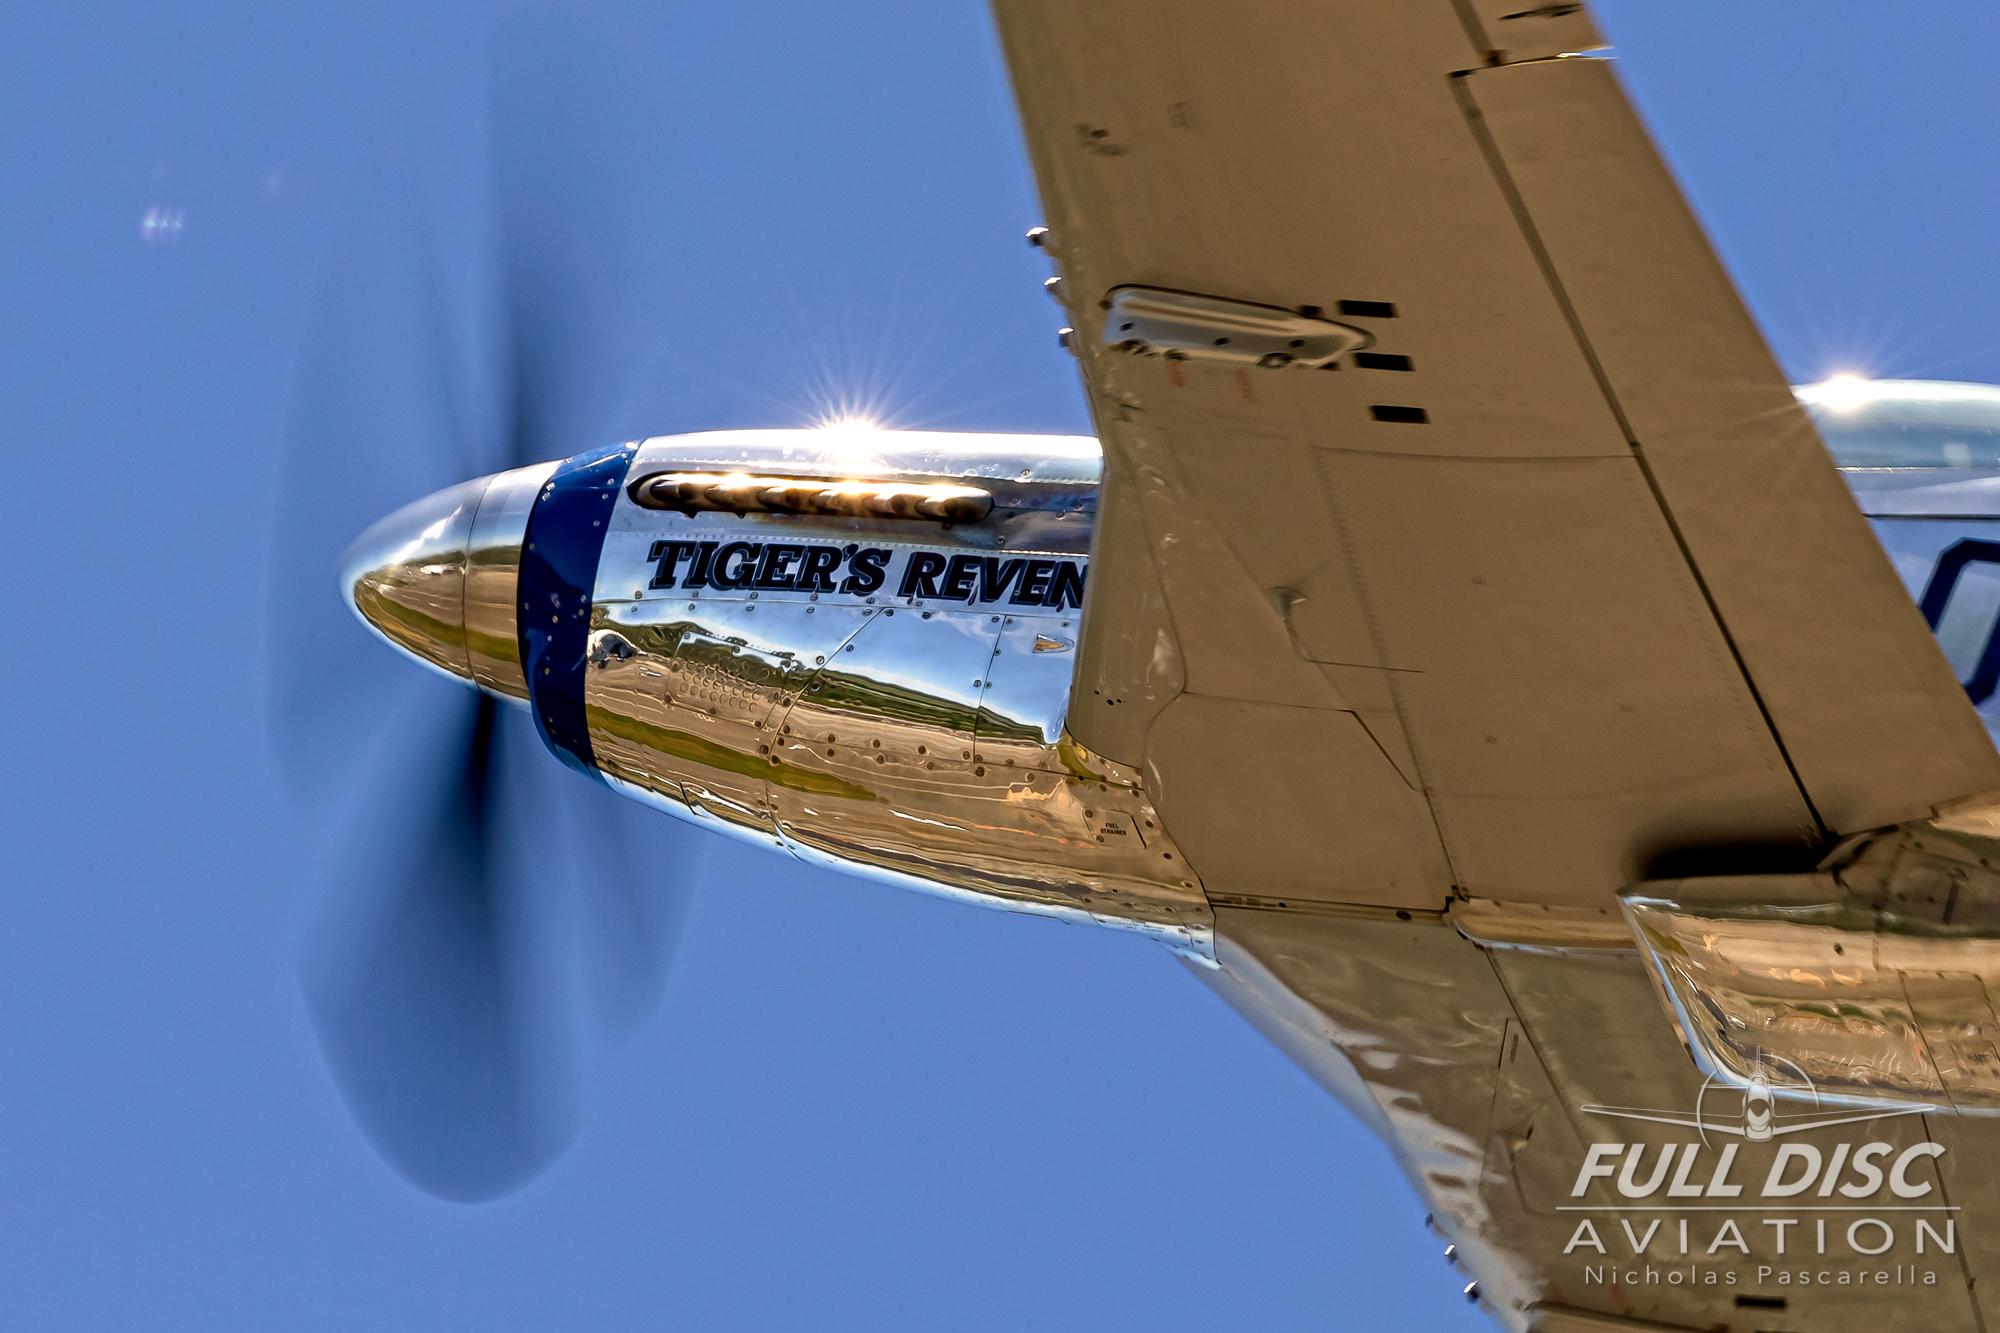 americanairpowermuseum_nicholaspascarella_nickpascarella_fulldiscaviation_legendsofairpower2019_aviation_warbird_tigersrevenge_polished_mustang_p51.jpg